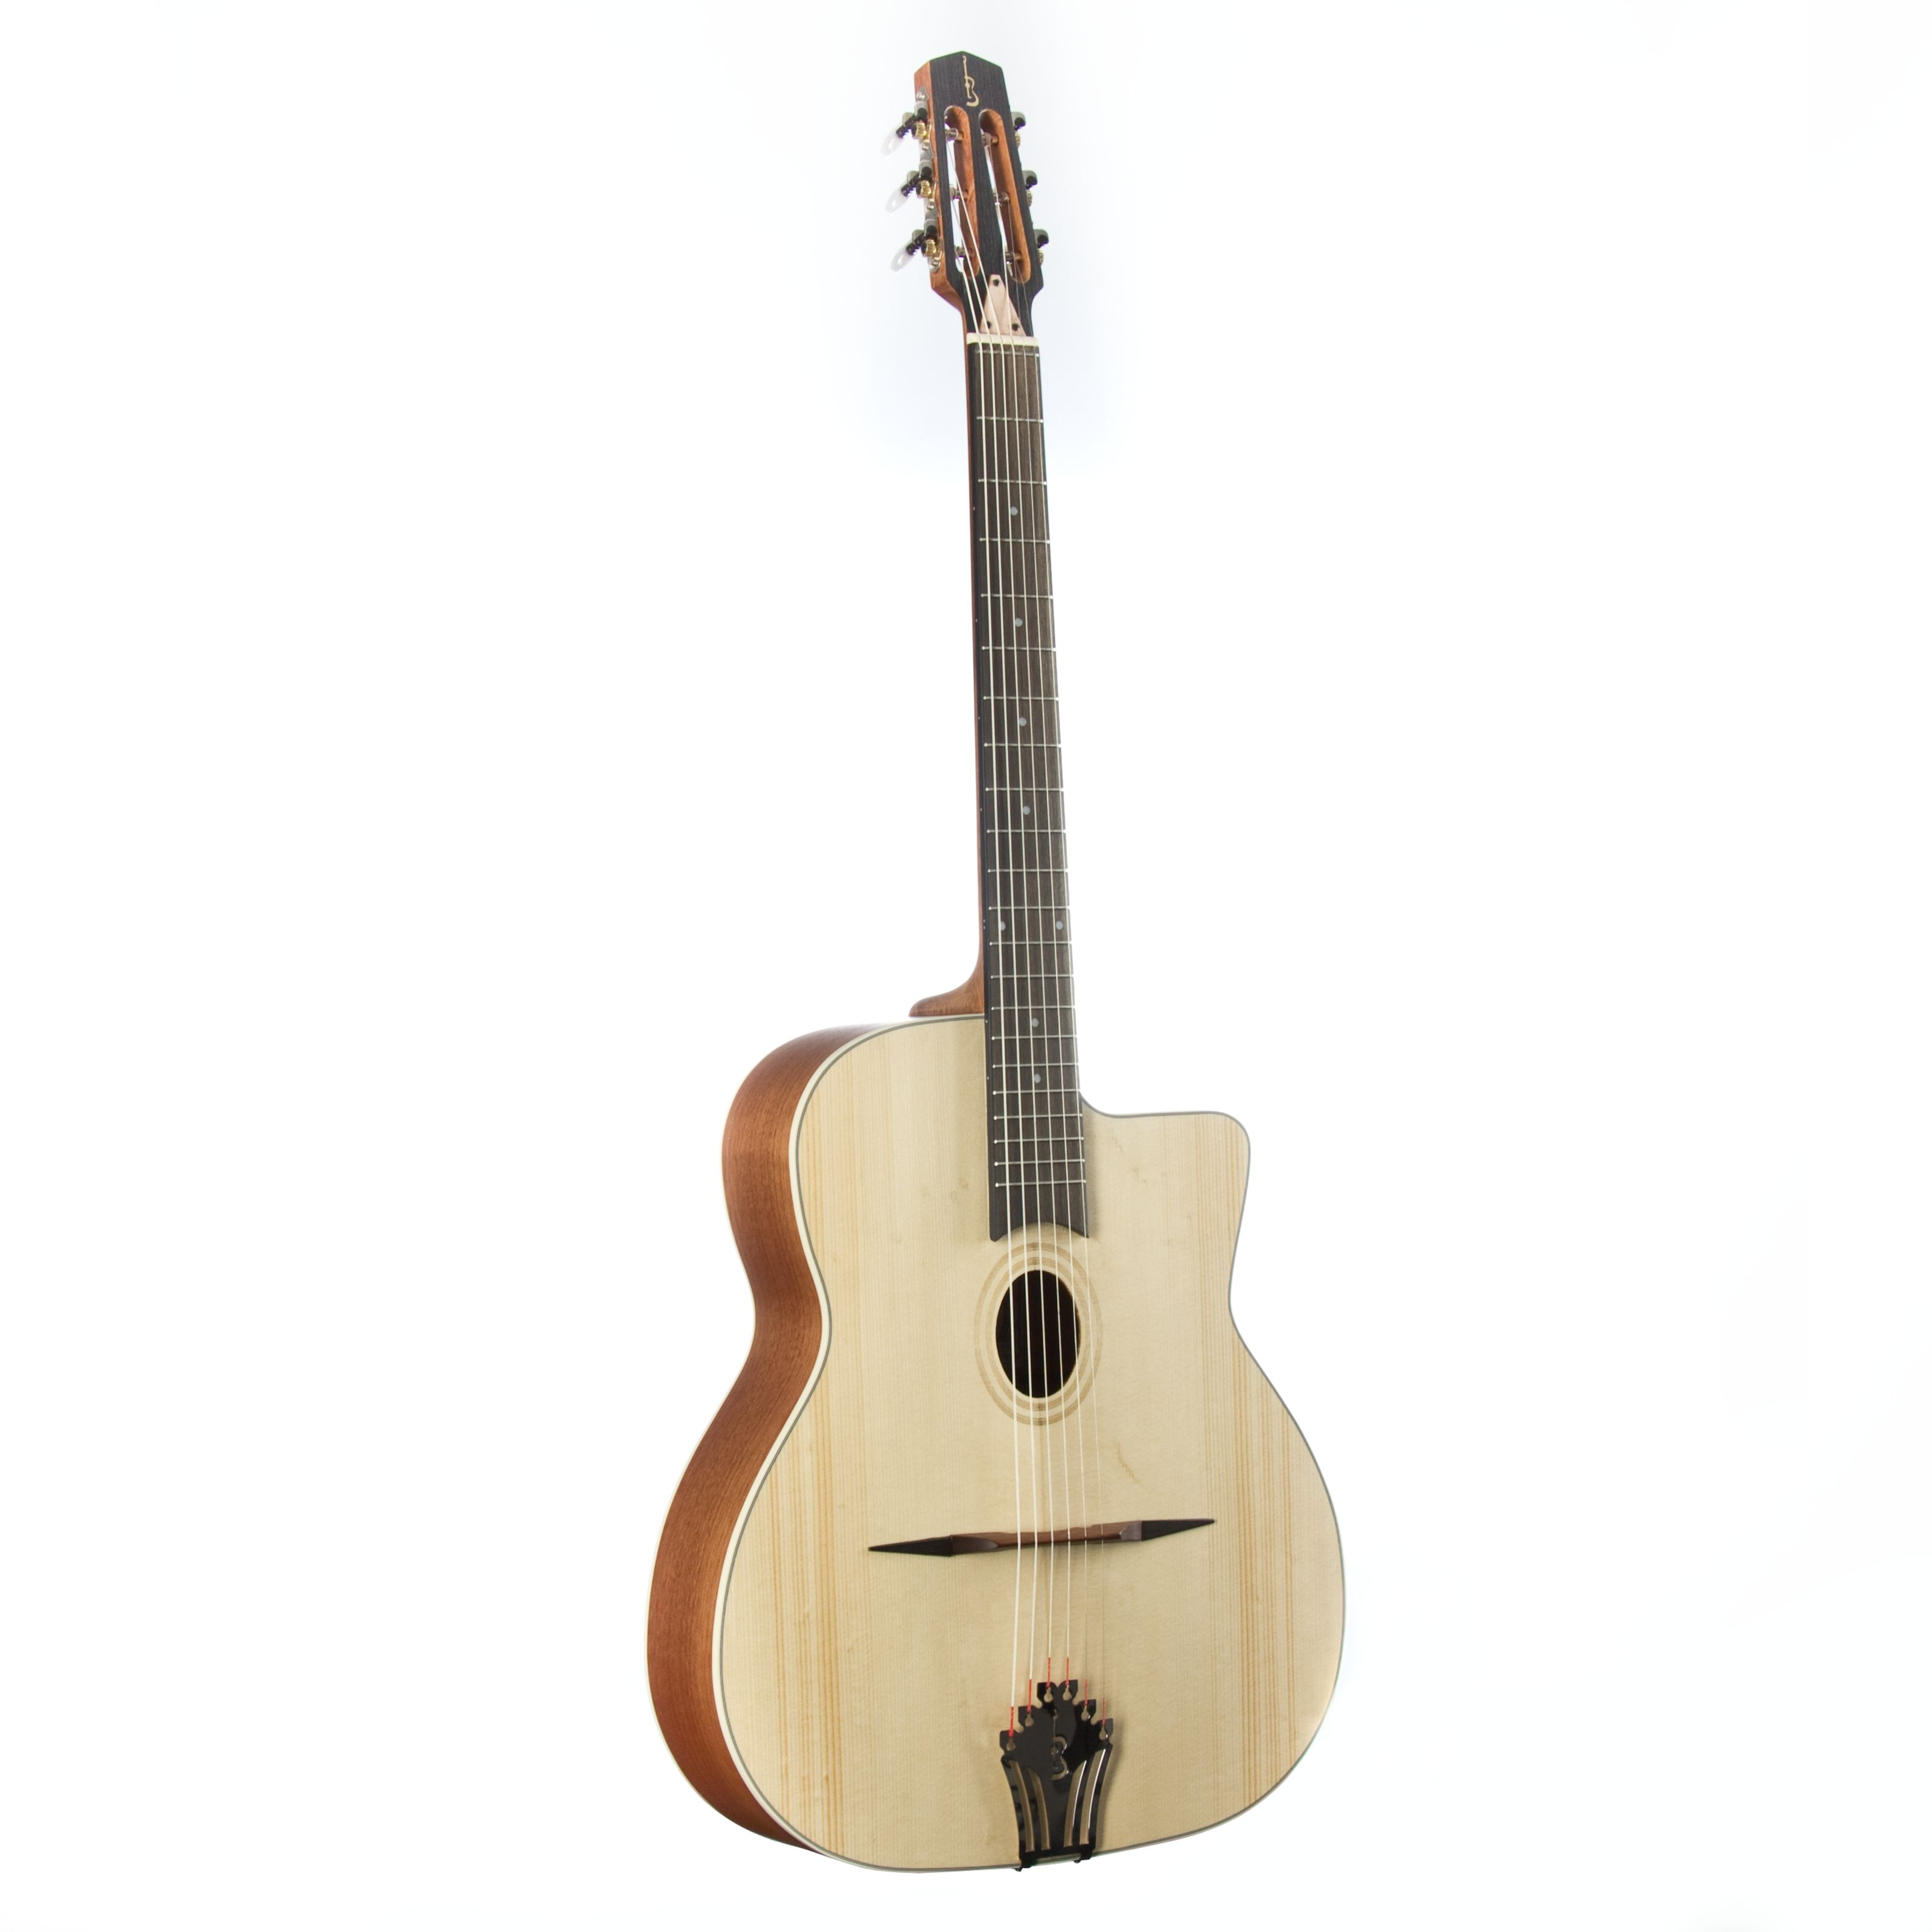 APC - JM 100 Jazz Manouche Guitar JM100